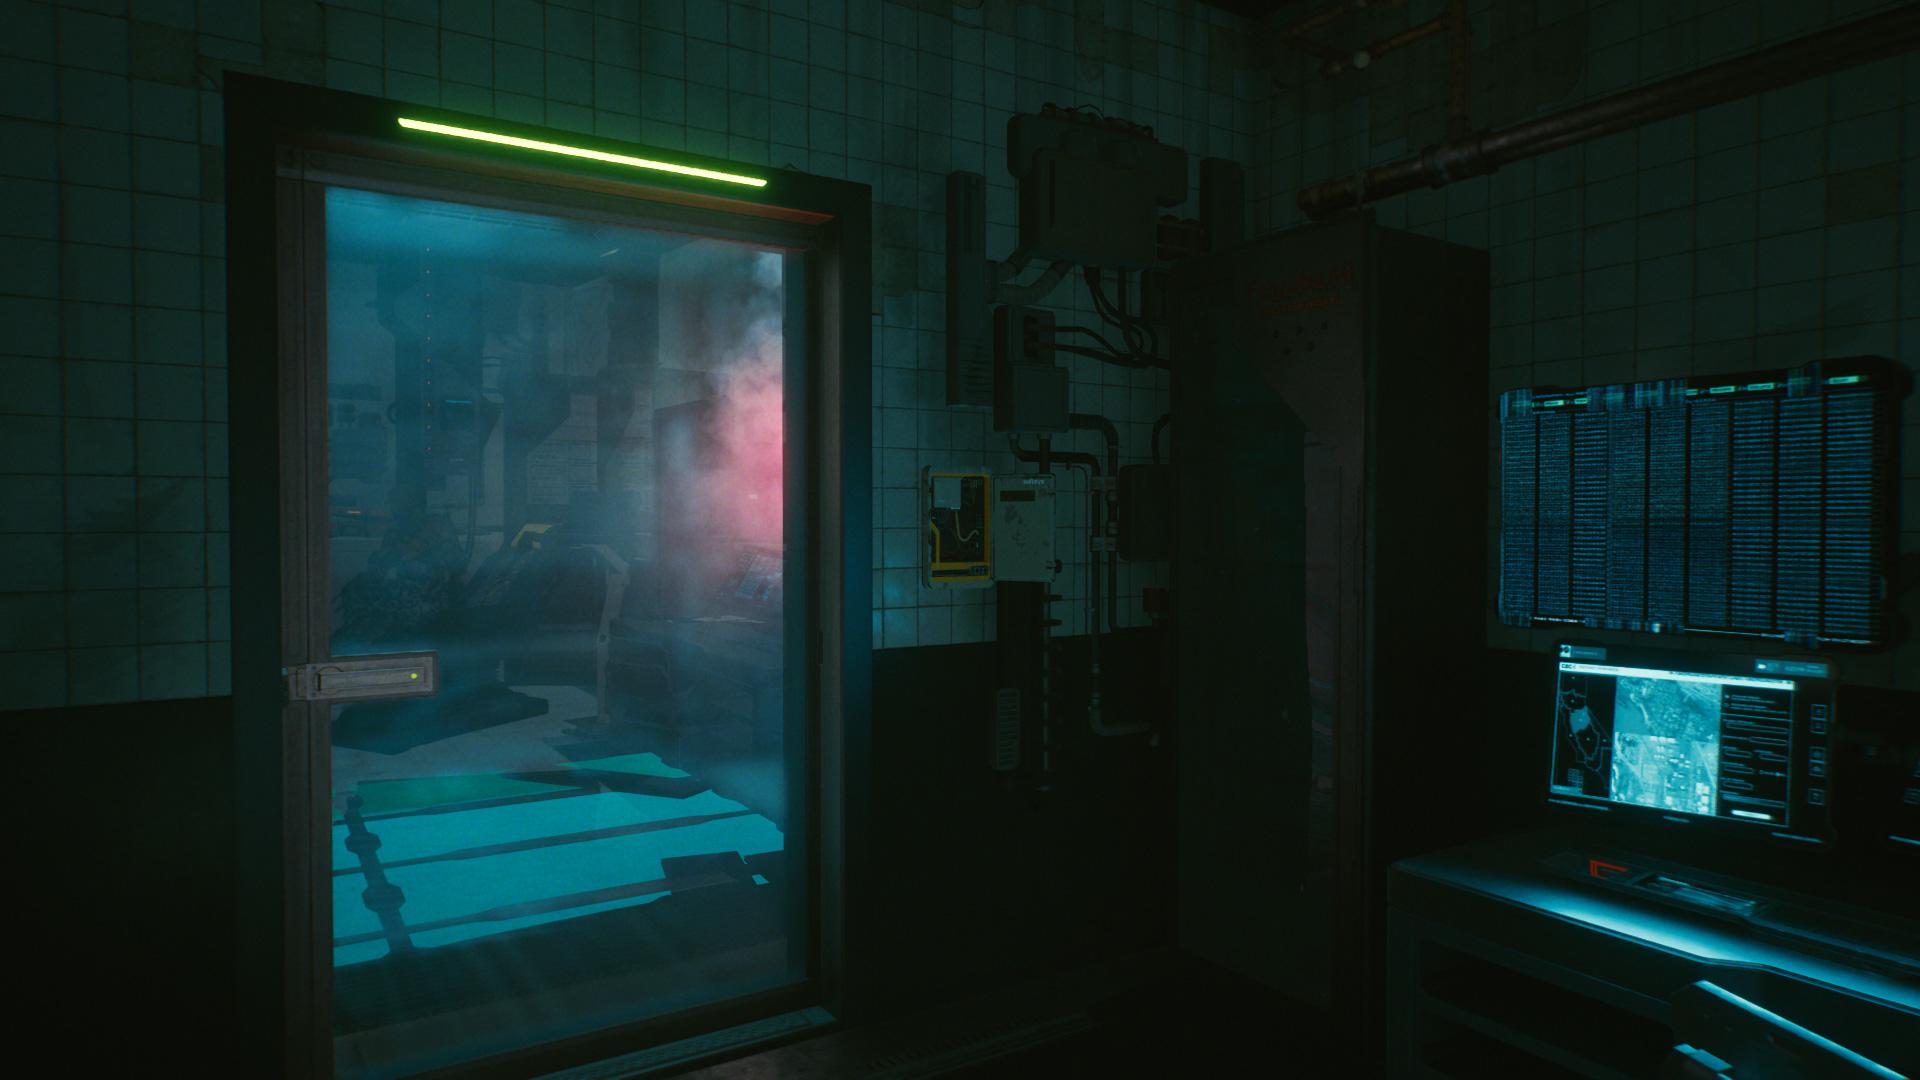 Comment enregistrer Nix dans Kold Mirage dans Cyberpunk 2077